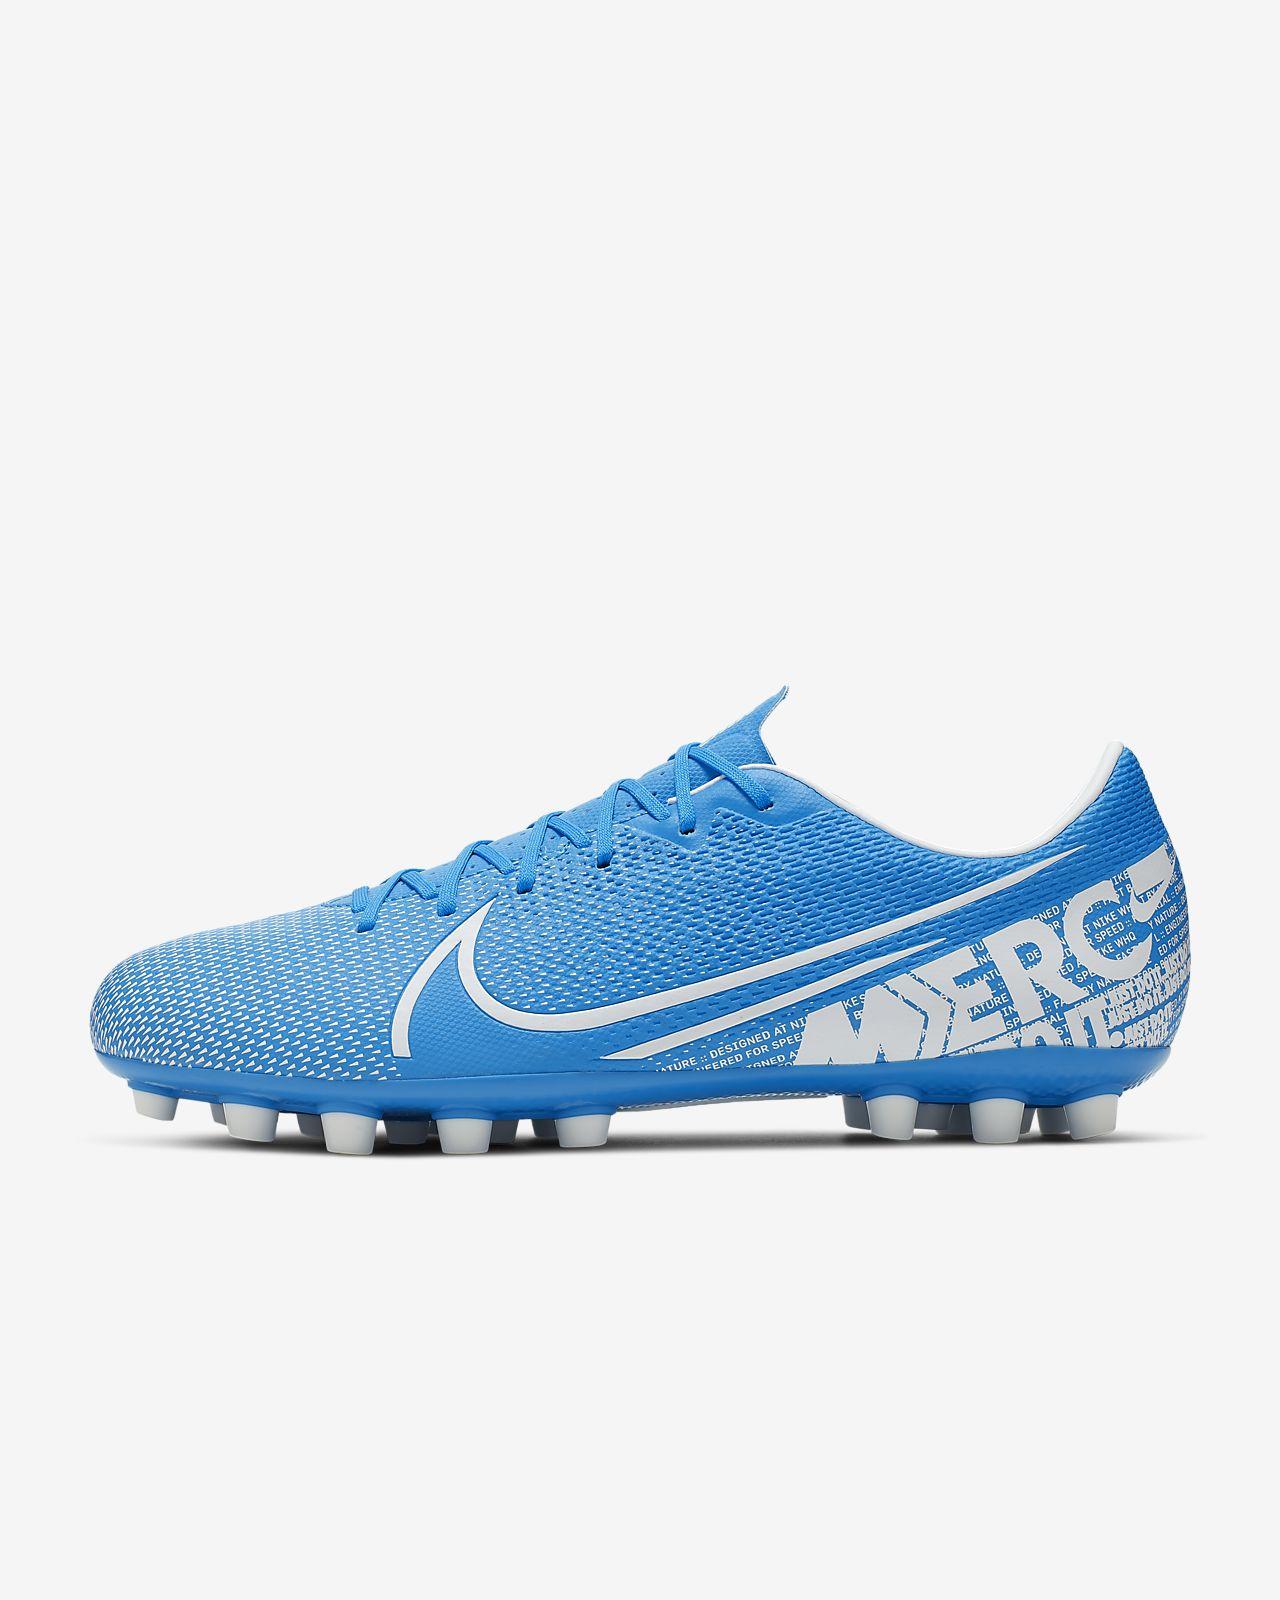 Nike Mercurial Vapor 13 Academy AG Voetbalschoen (kunstgras)